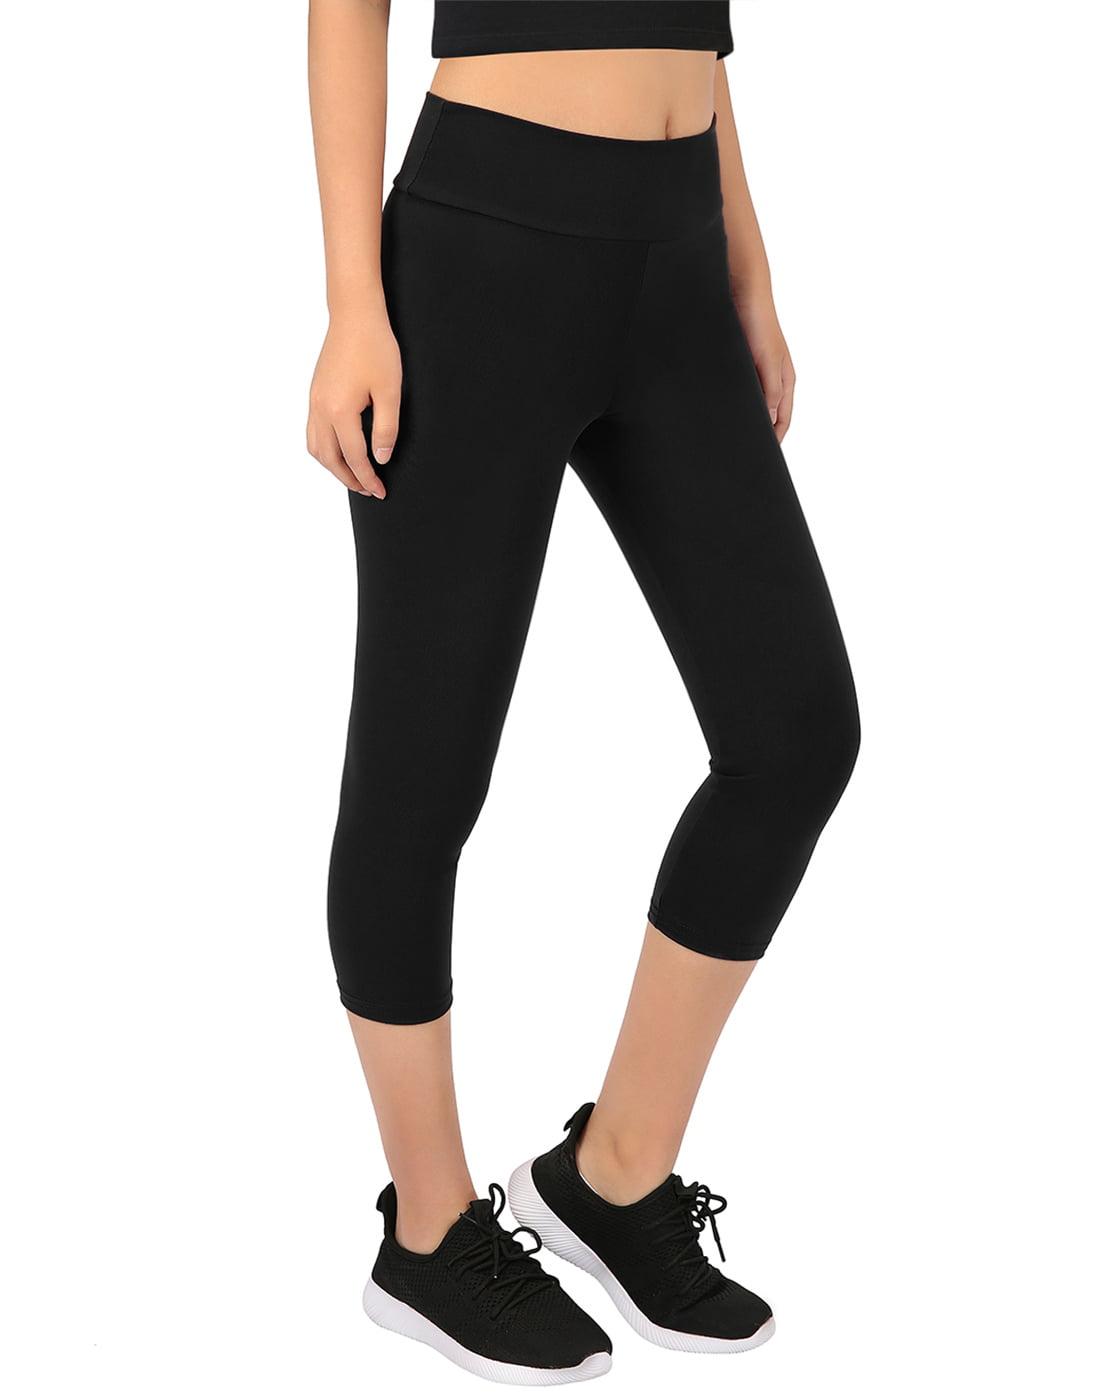 4428866d0 HDE - HDE Womens Scrunch Butt Lifting Capri Leggings High Waist Workout Gym Yoga  Pants (Charcoal